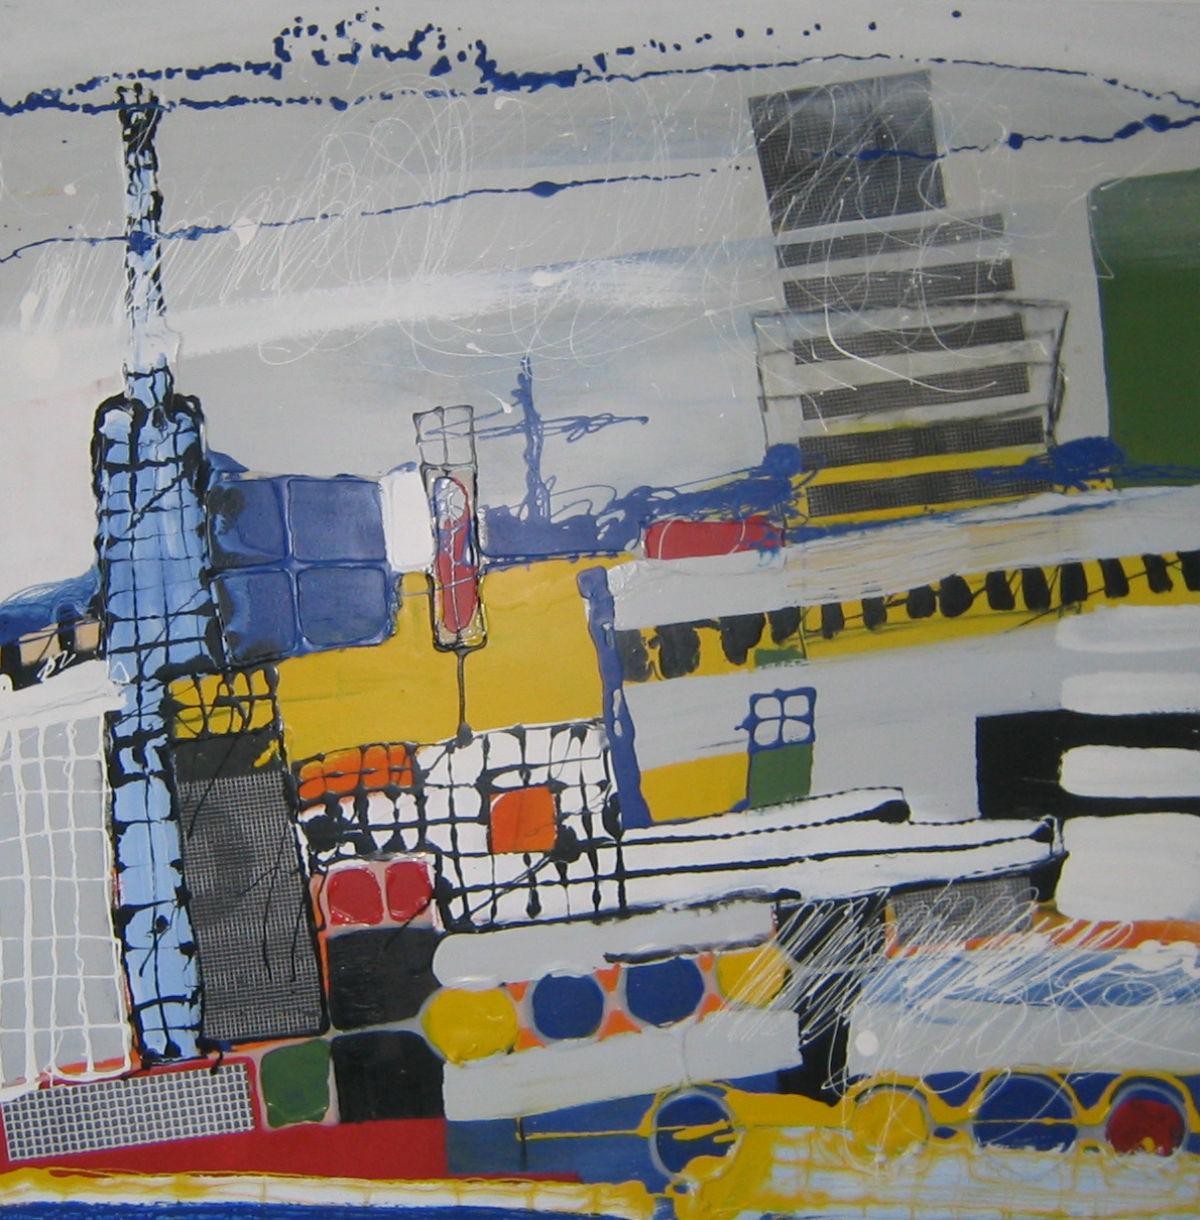 Ohne Titel, Lack, Heißkleber auf Holz, 100 cm x 100 cm, Privatbesitz